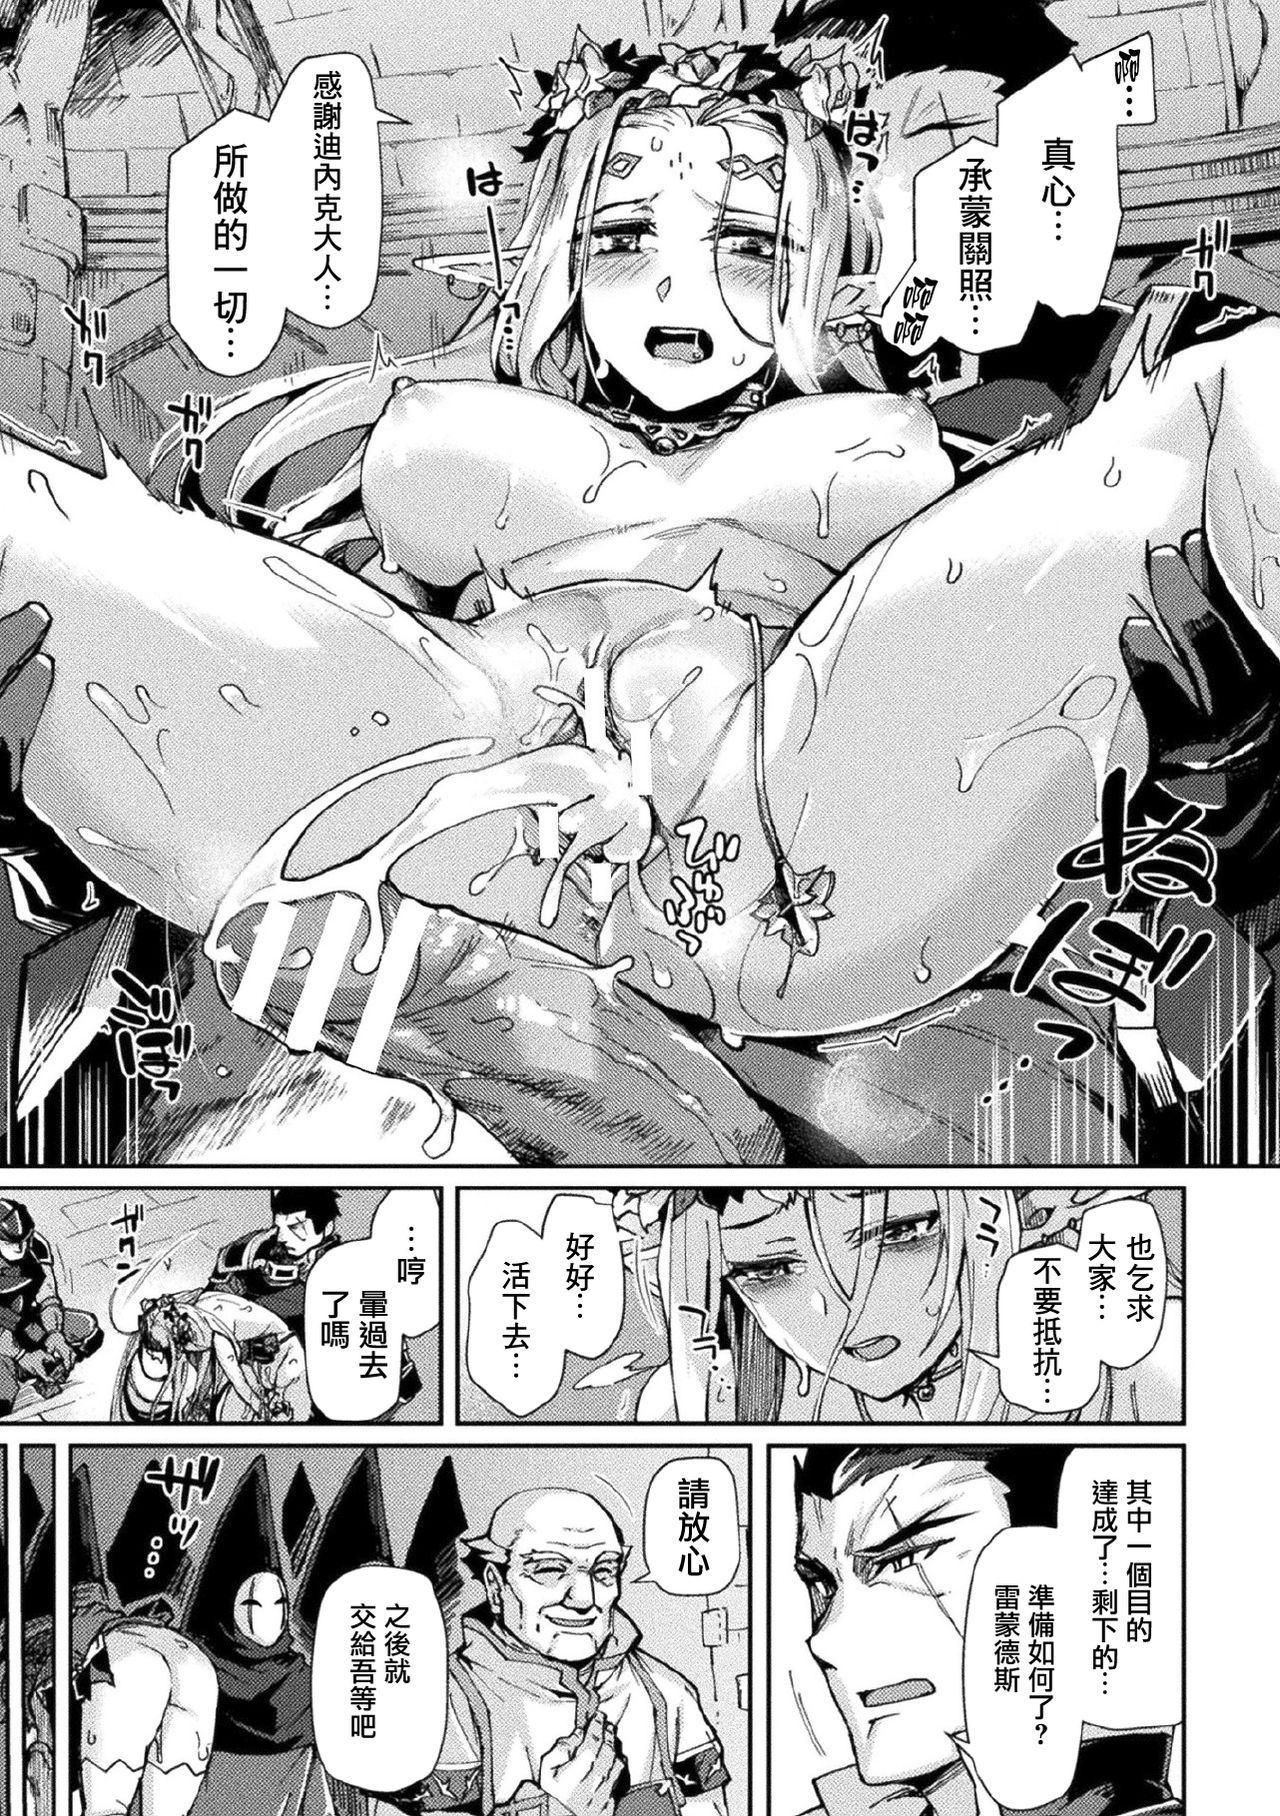 [Tsukitokage] Kuroinu II ~Inyoku ni Somaru Haitoku no Miyako, Futatabi~ THE COMIC Chapter 8 (Kukkoro Heroines Vol. 11) [Digital] [Chinese] [鬼畜王漢化組] [Digital] 9